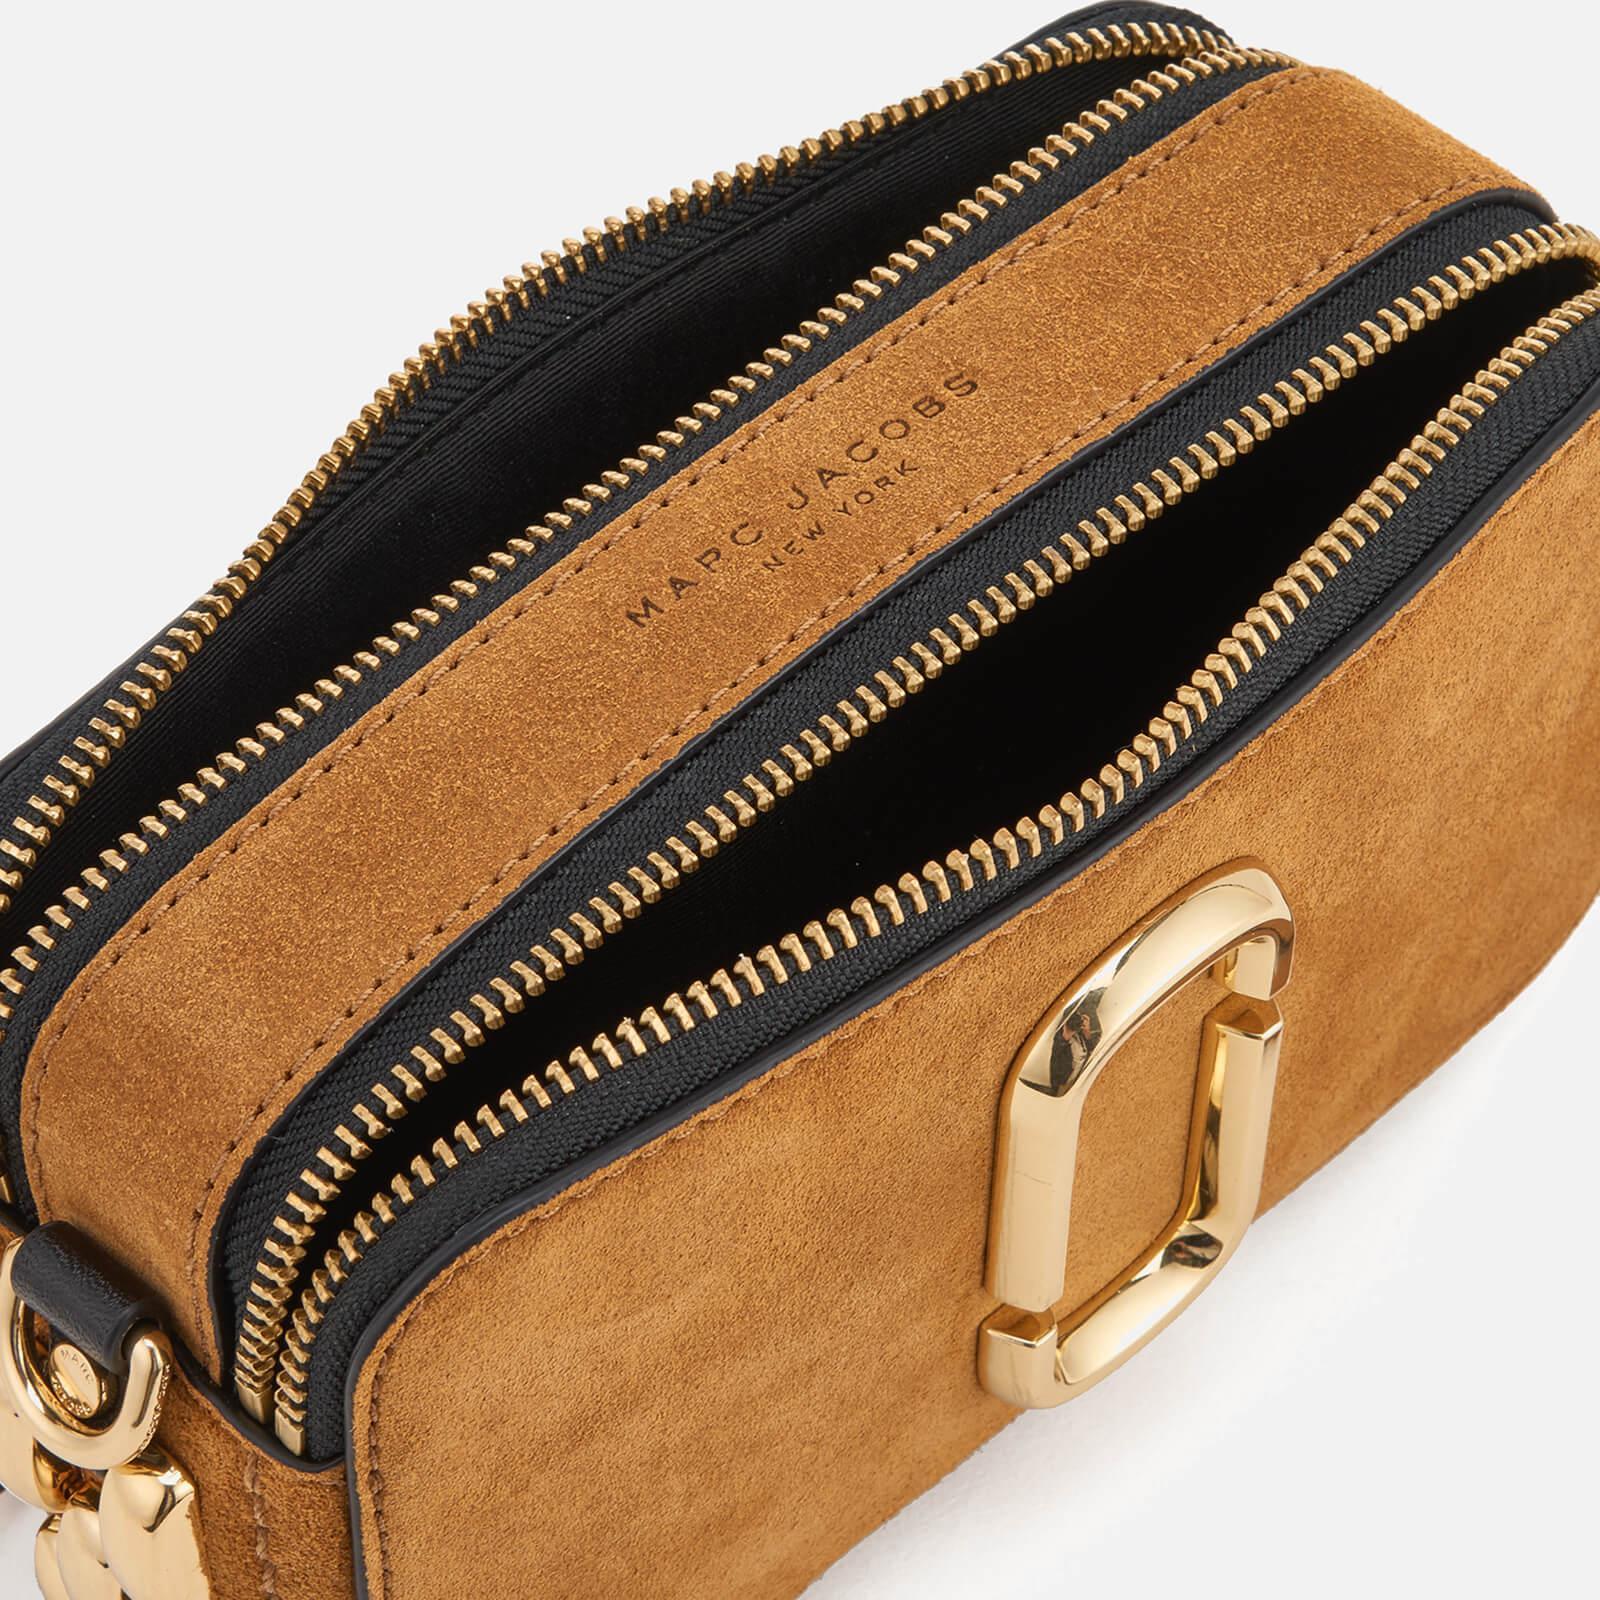 ceb4673cba56e Lyst - Marc Jacobs Chain Snapshot Cross Body Bag